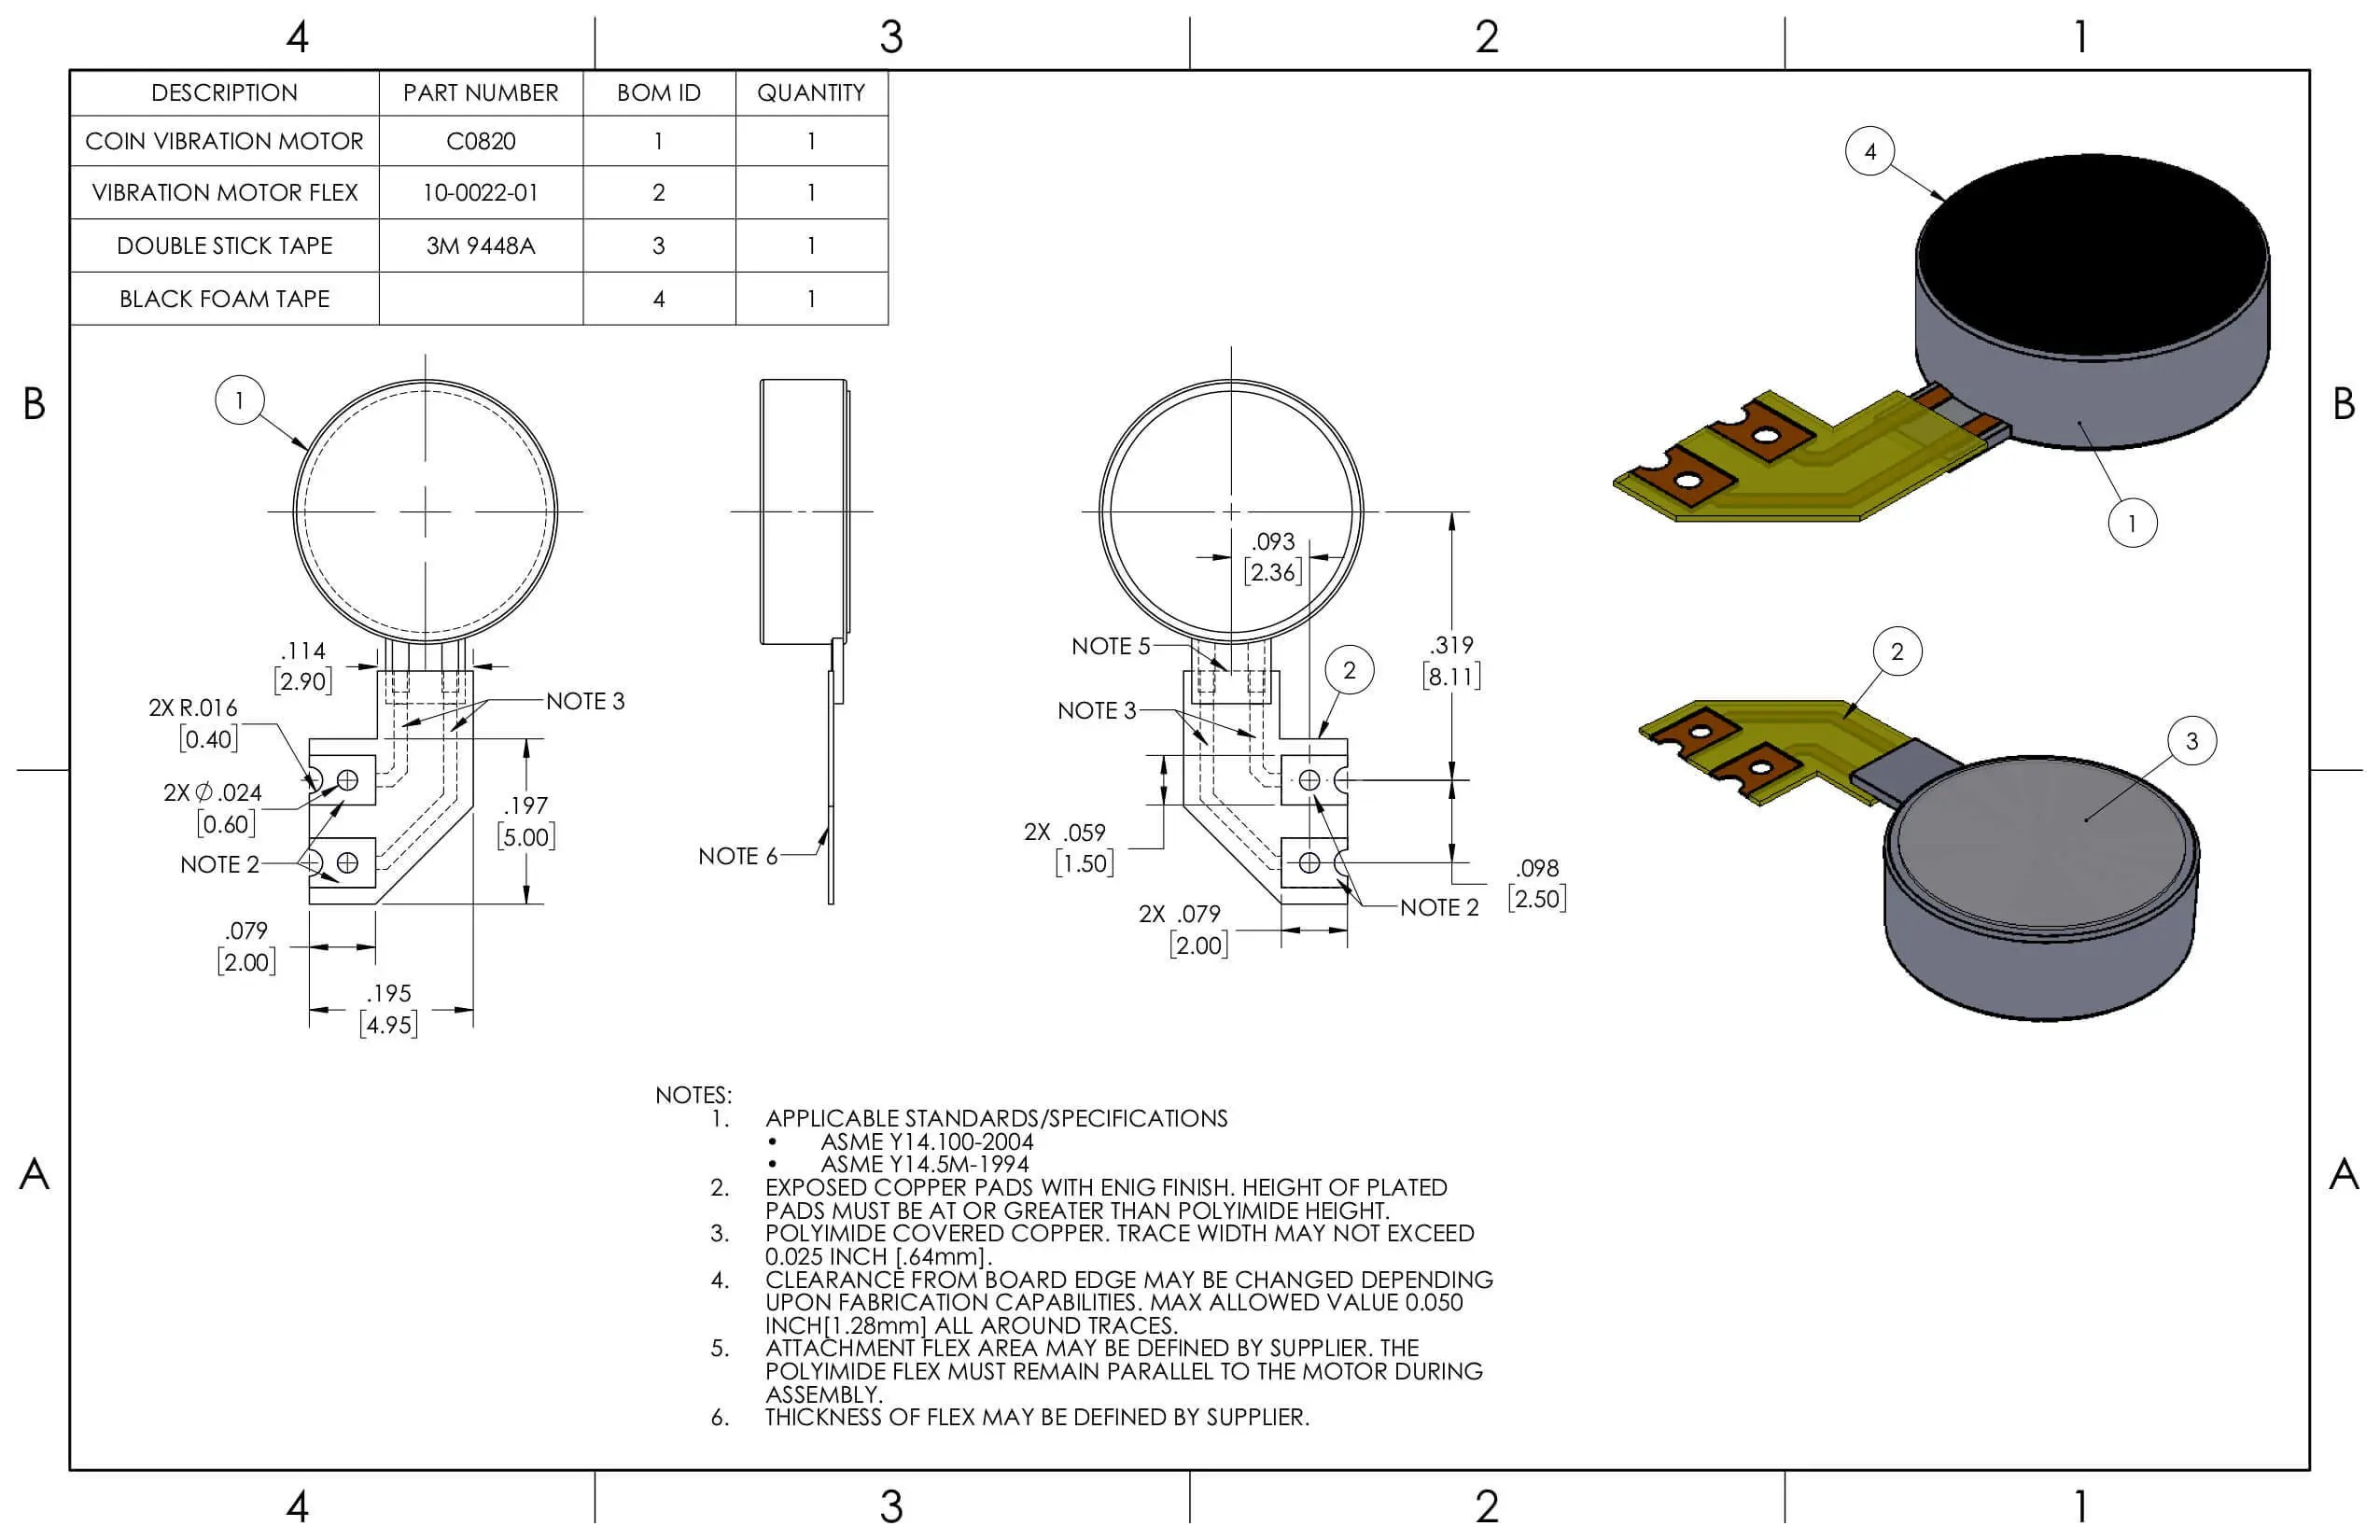 Nfp Coin Motor C Vibration Motor 3vdc